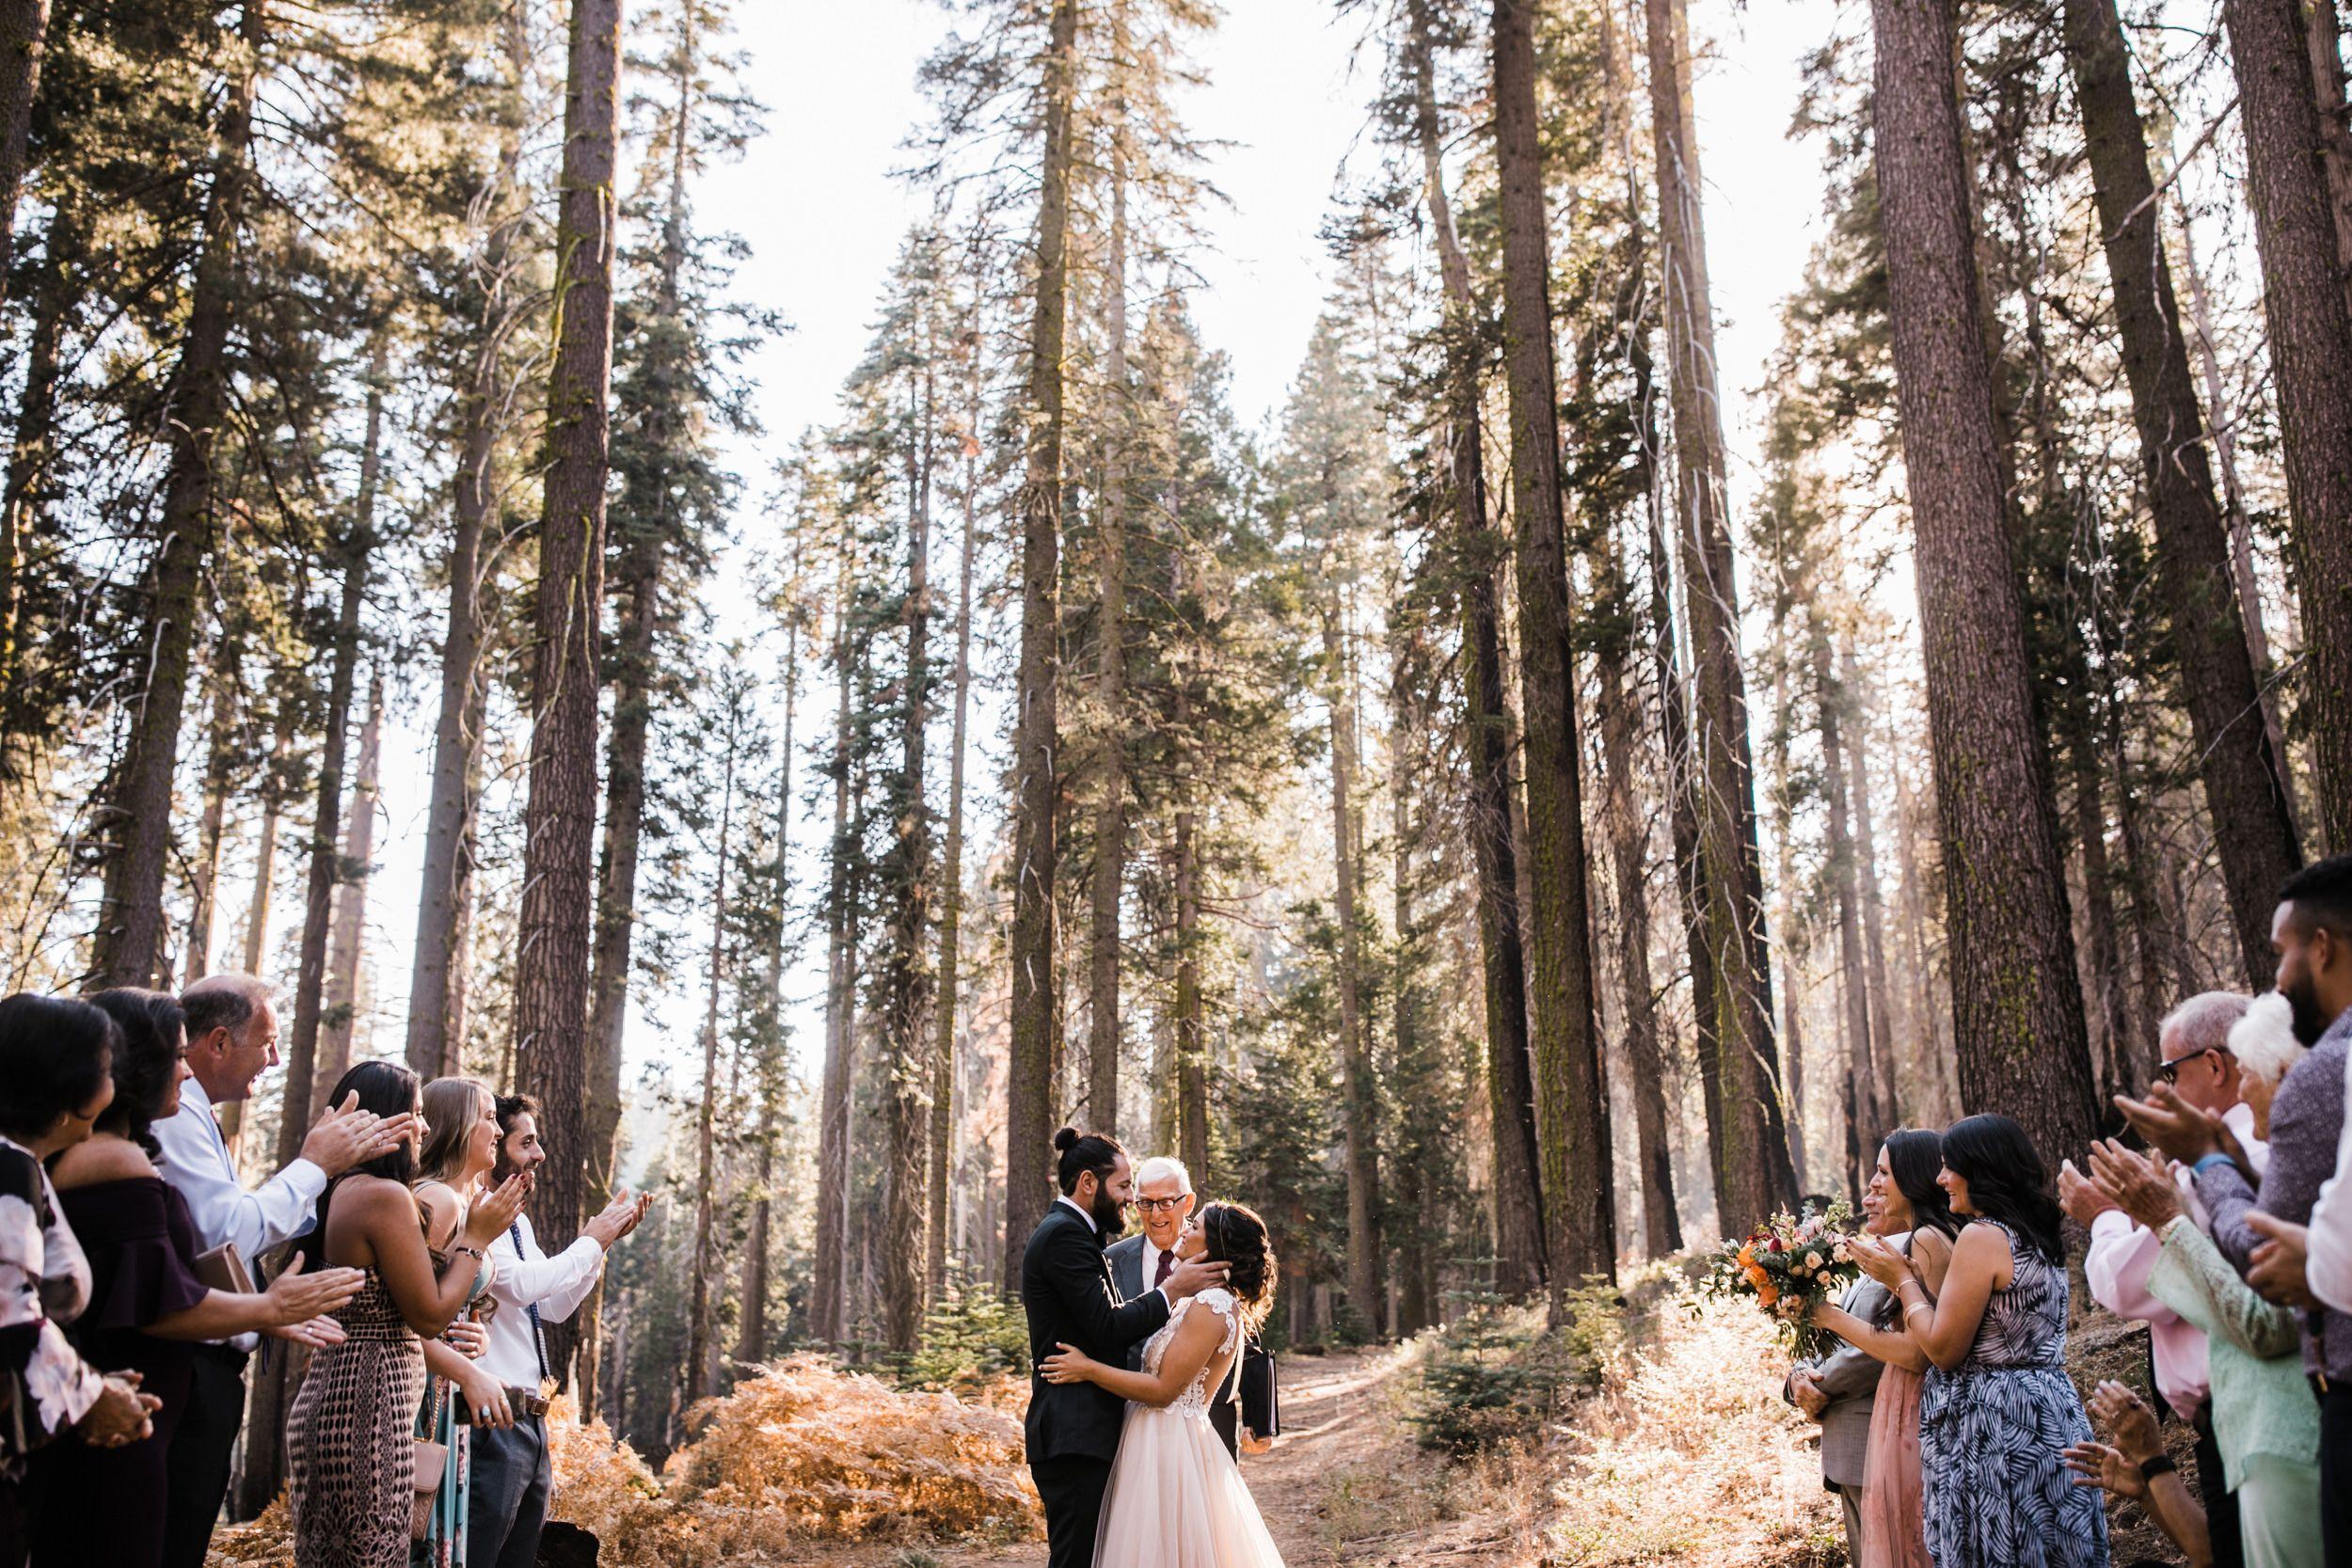 Intimate Wedding In Yosemite National Park Yosemite Elopement Photographer Adventure Wedding Elopement Photographers In Moab Yosemite And Beyond The H Yosemite Elopement Adventure Wedding Yosemite National Park